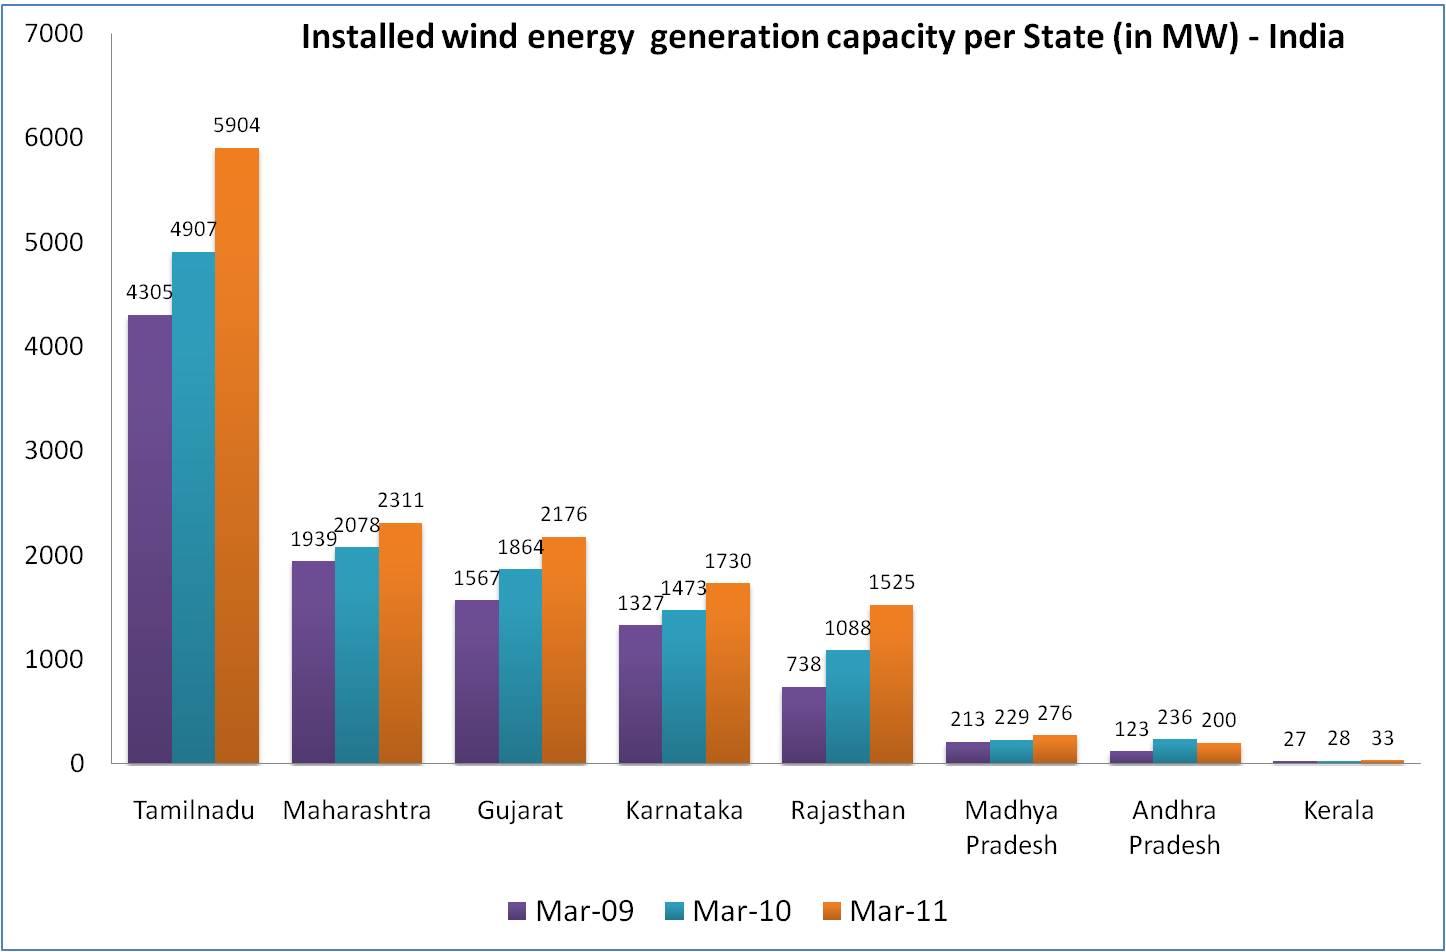 Indian wind energy scenario_Installed Wind Capacity per state